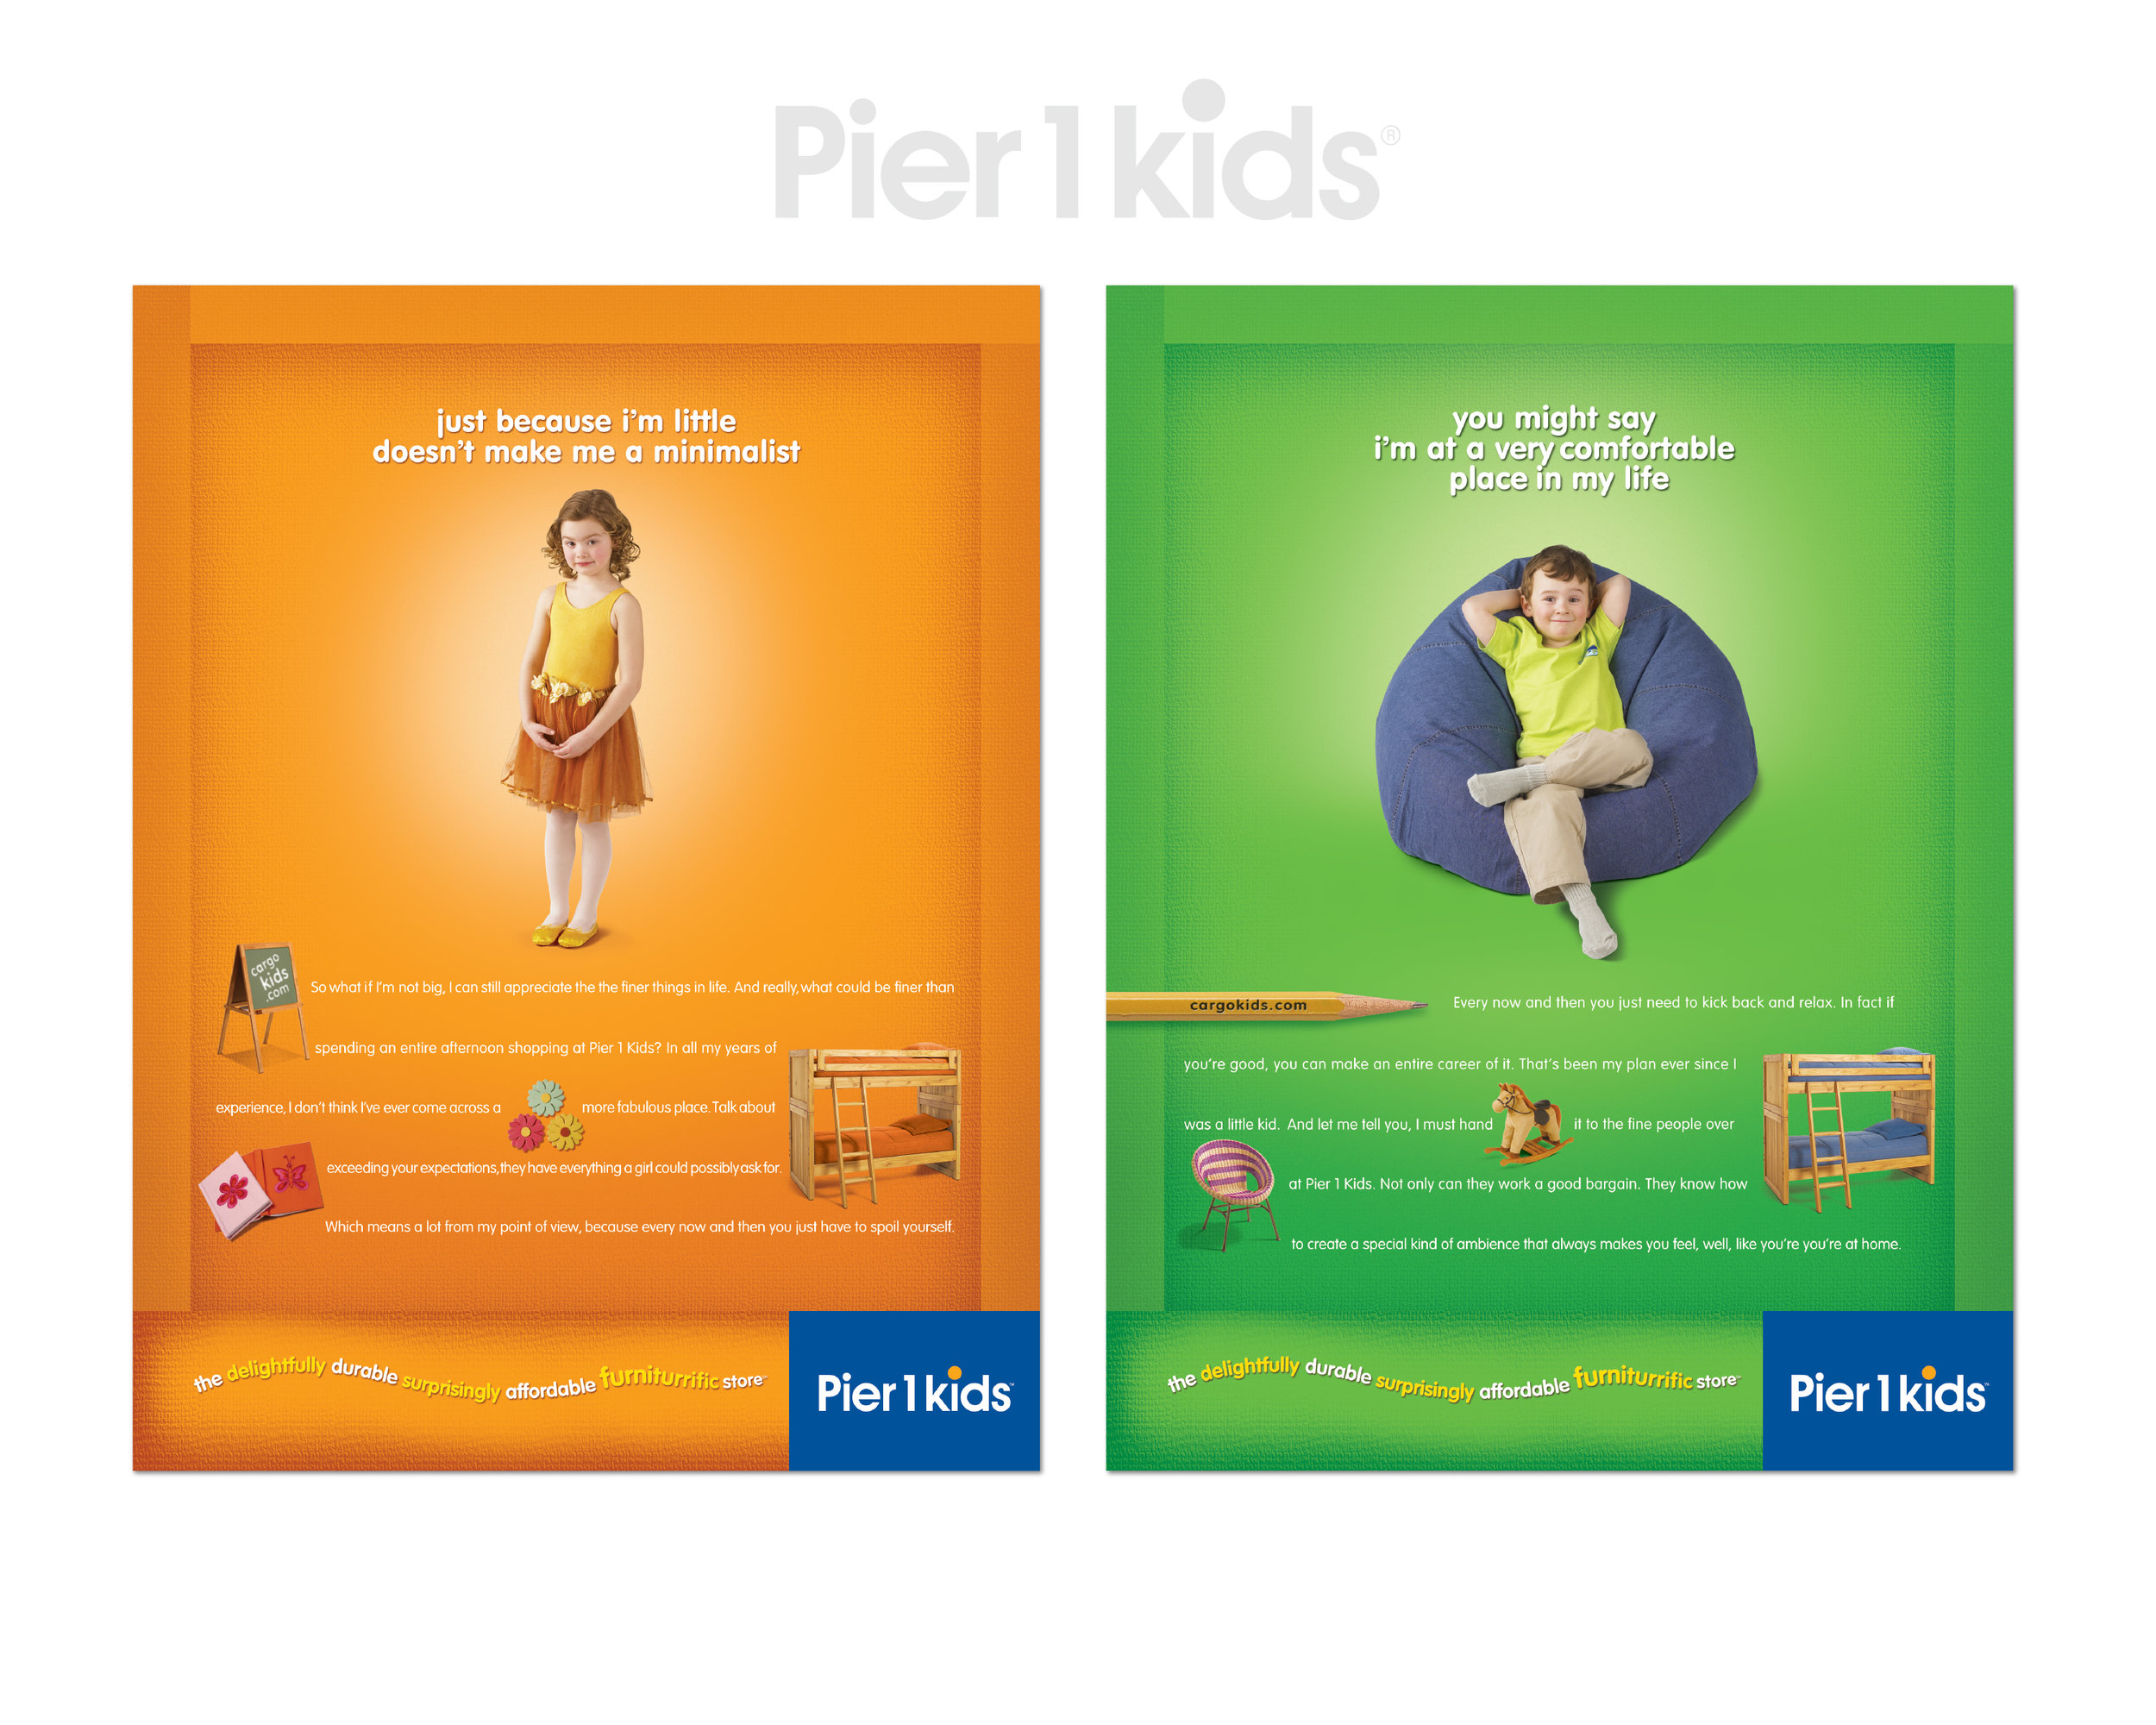 PIER 1 KIDS ADS 1.jpg